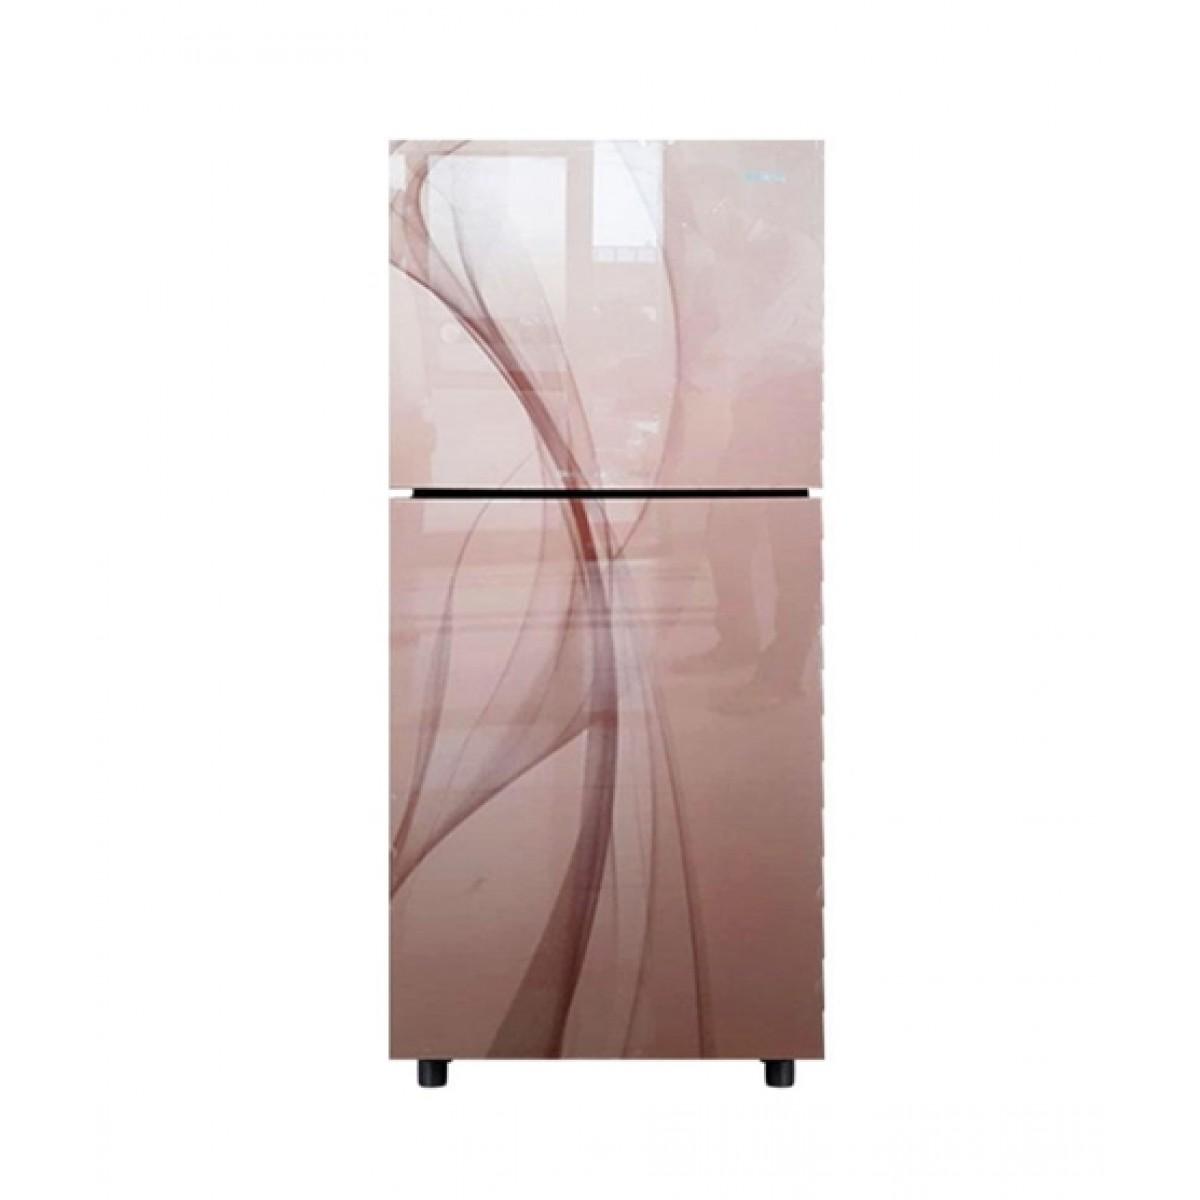 Orient Crystal 200 Freezer-on-Top Refrigerator 7 Cu Ft Glaze Golden